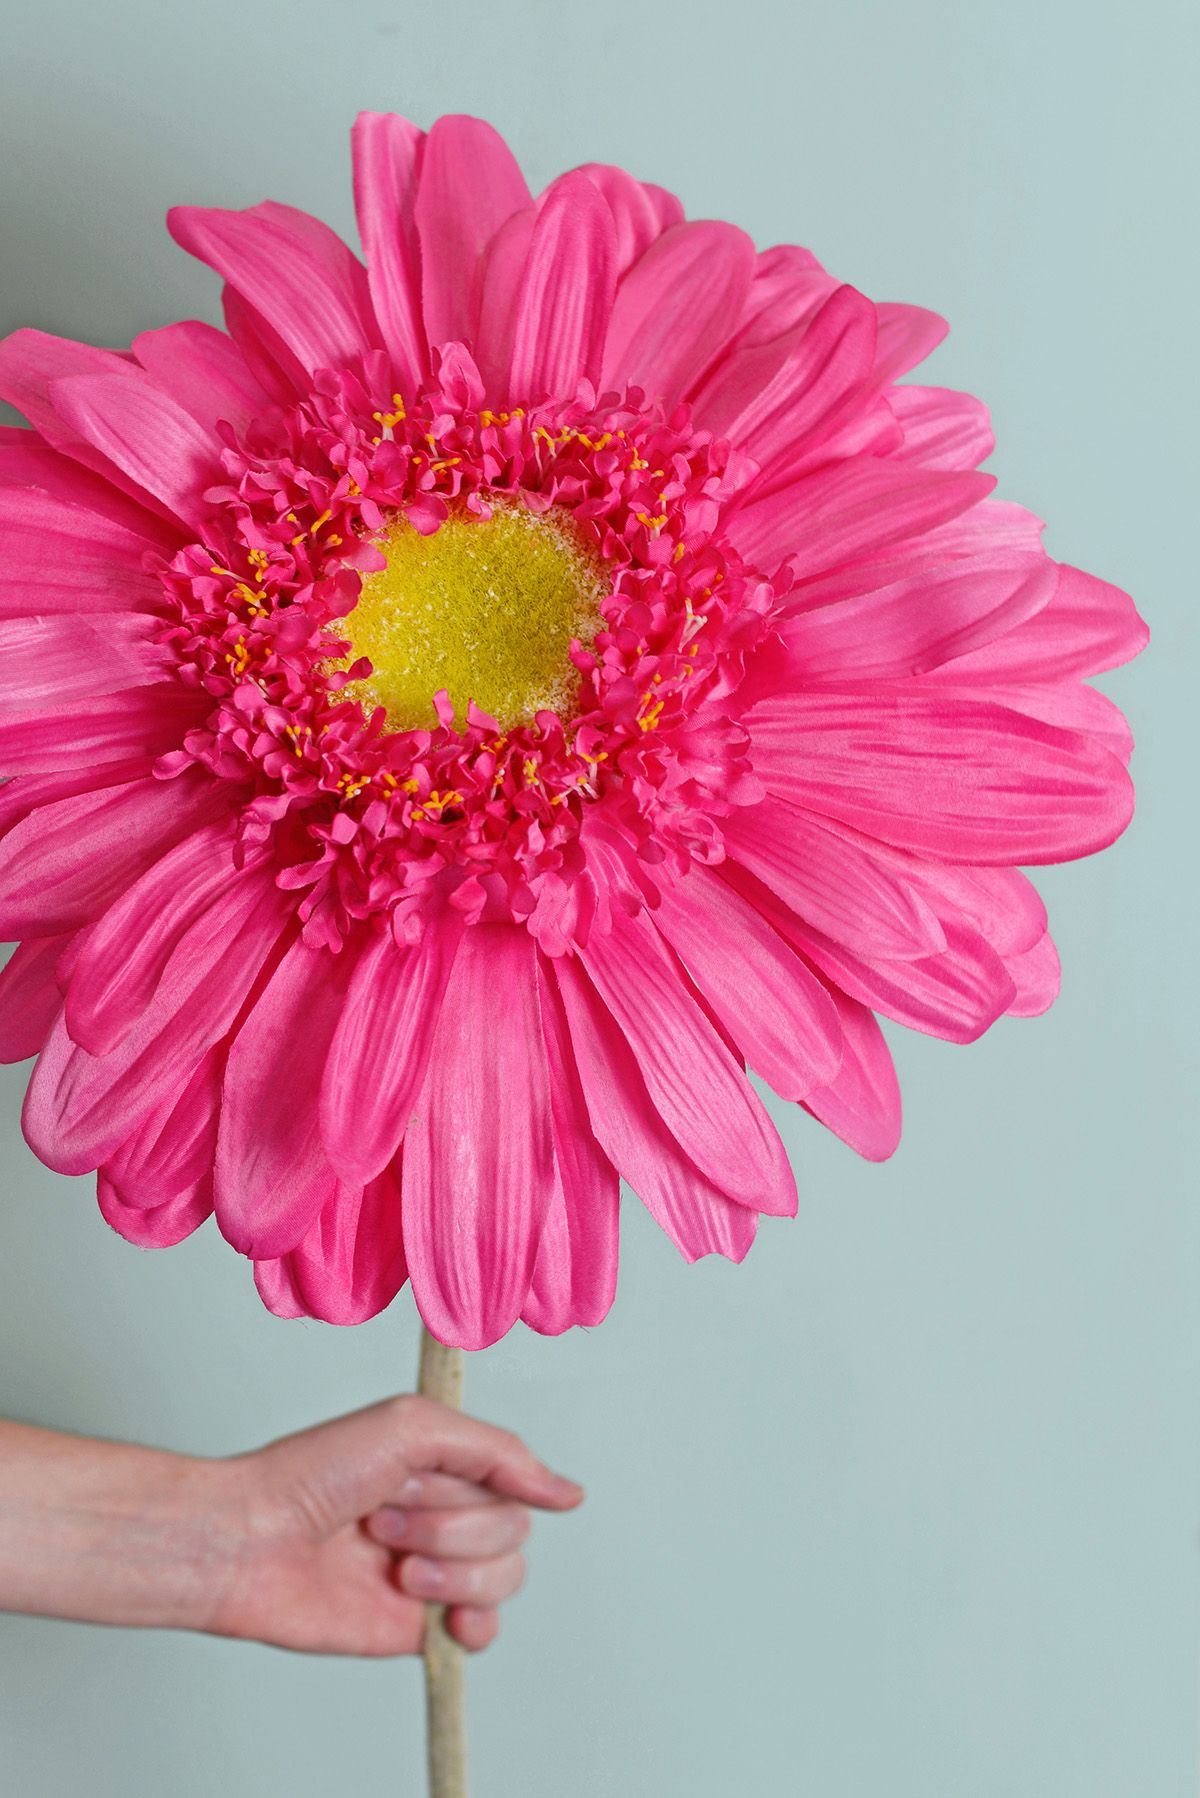 34 silk jumbo ruffle gerbera daisy flower spray cerise pink 34 silk jumbo ruffle gerbera daisy flower spray cerise pink dhlflorist Gallery